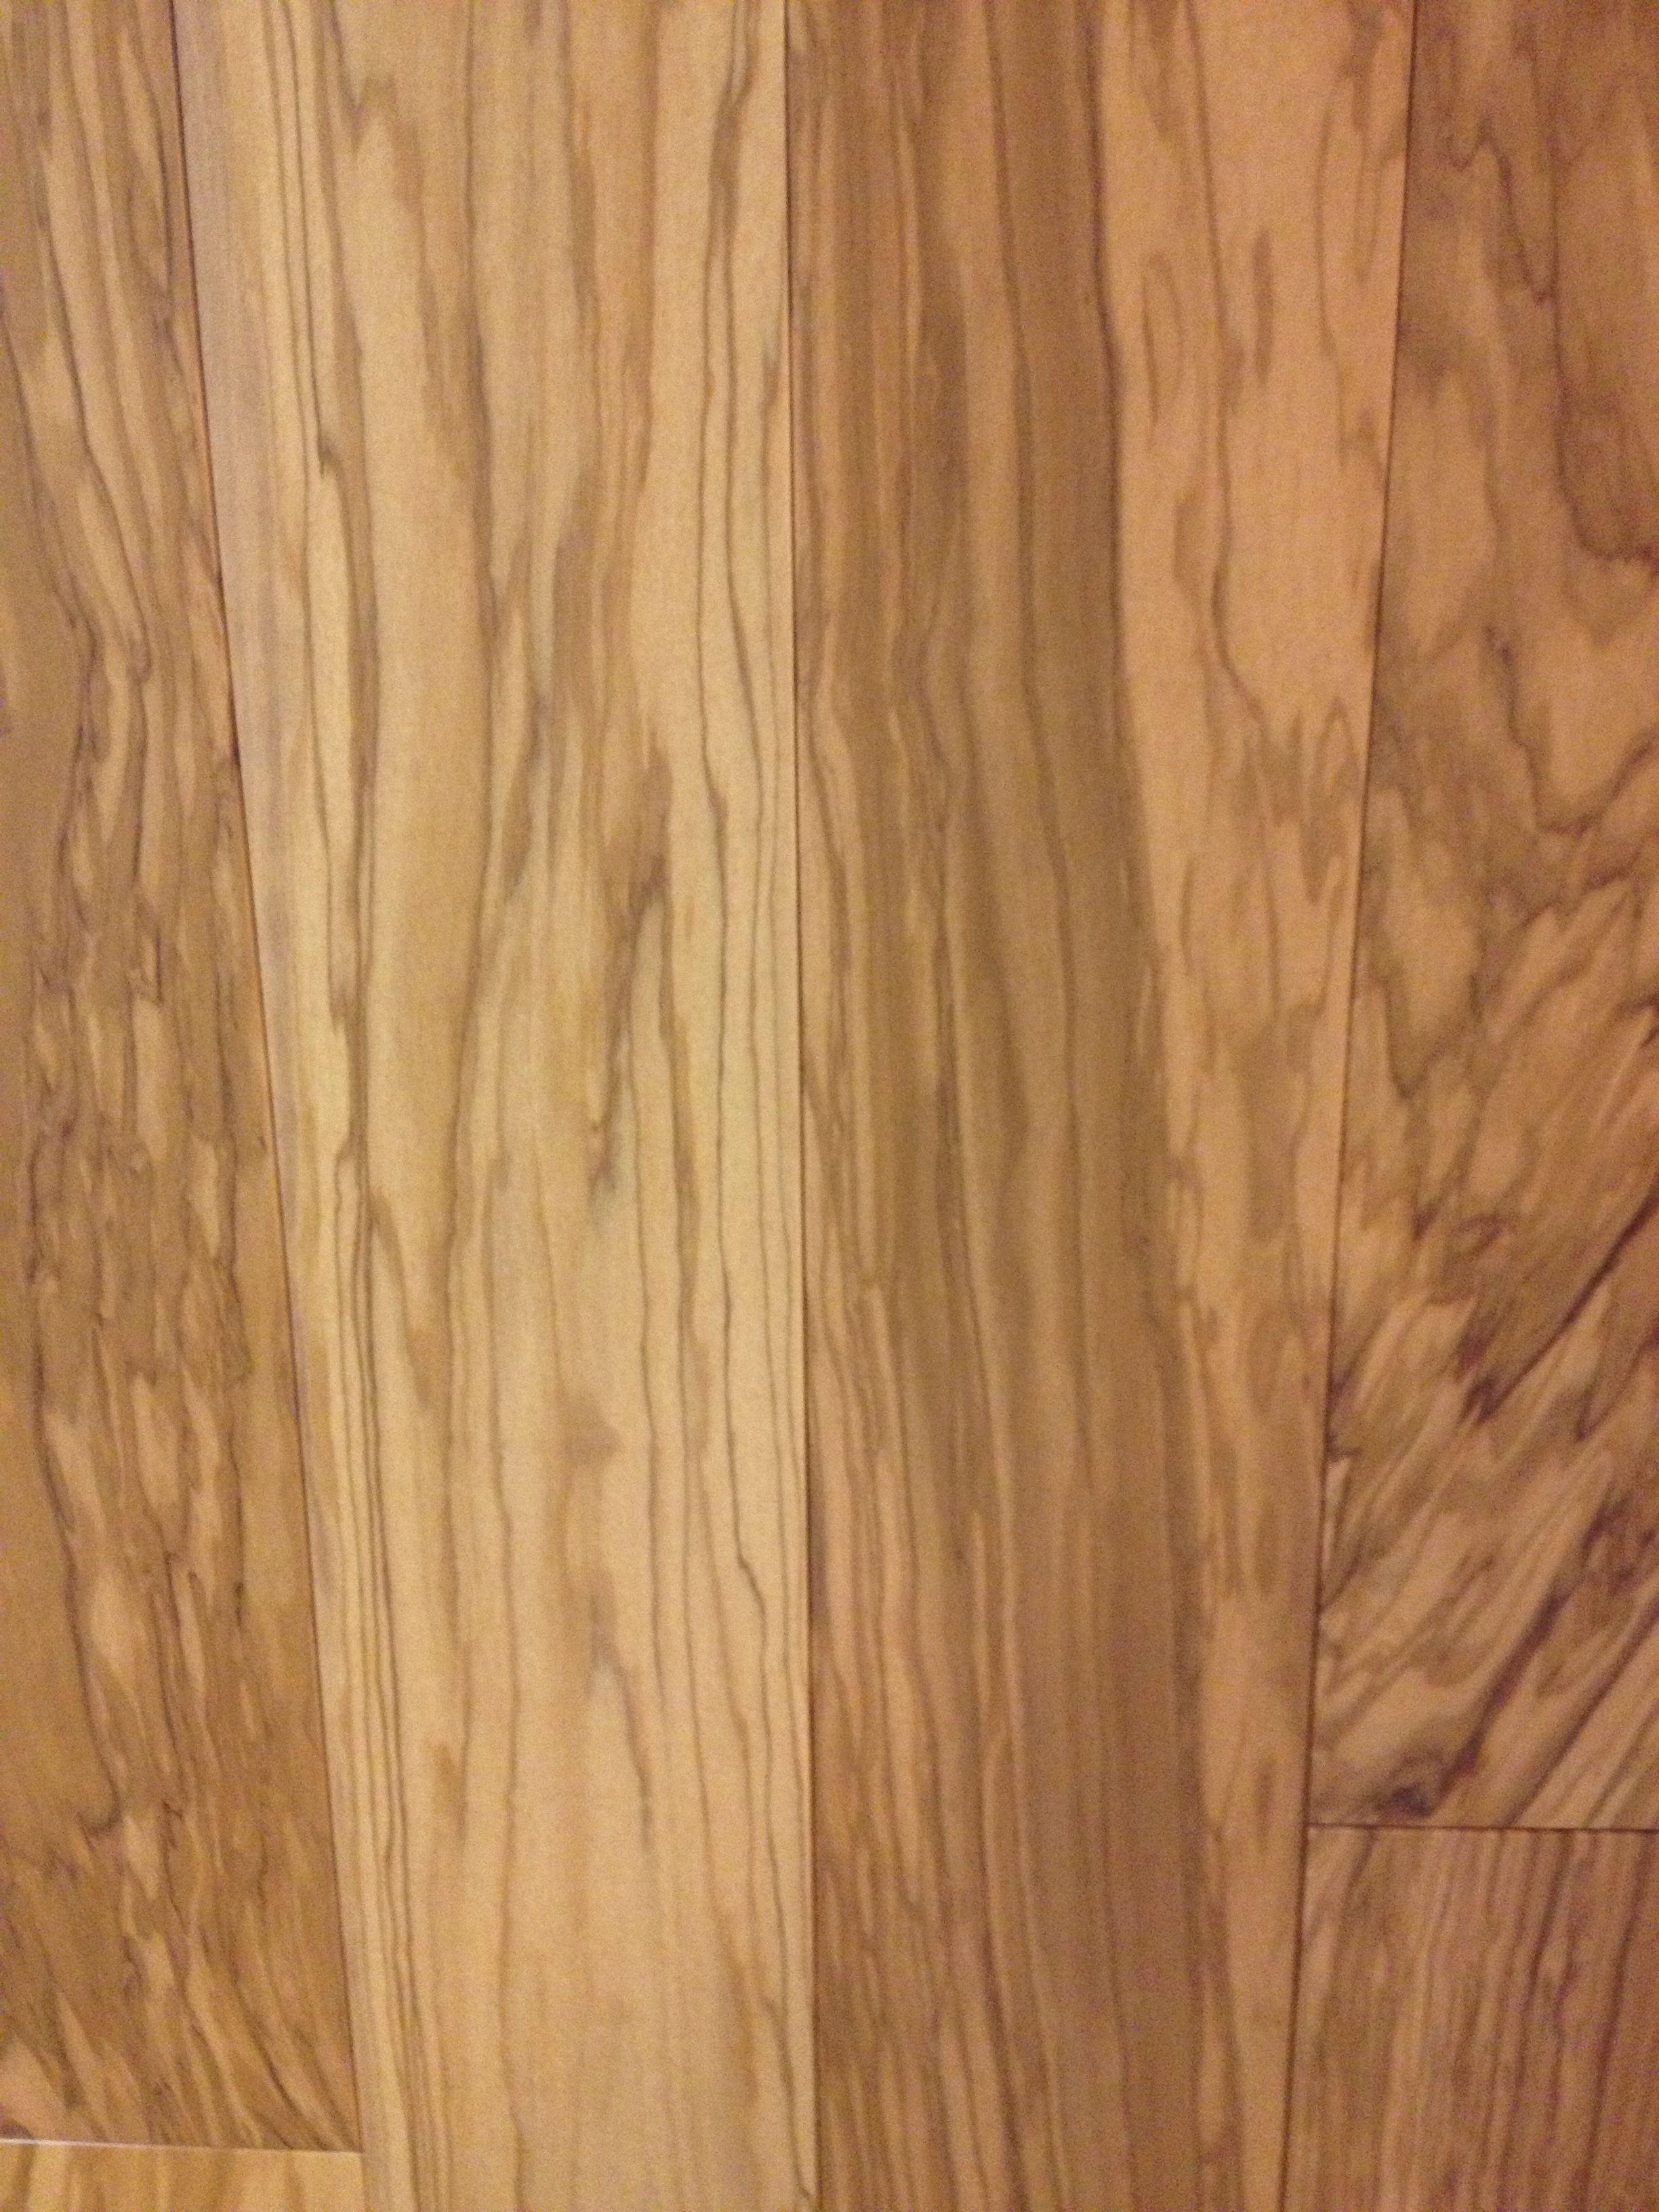 Hardwood Flooring Liquidators toronto Of Tuscany Olive Wood Floor there is Nothing Quite Like Olive Wood for for Tuscany Olive Wood Floor there is Nothing Quite Like Olive Wood for Turning Your Home